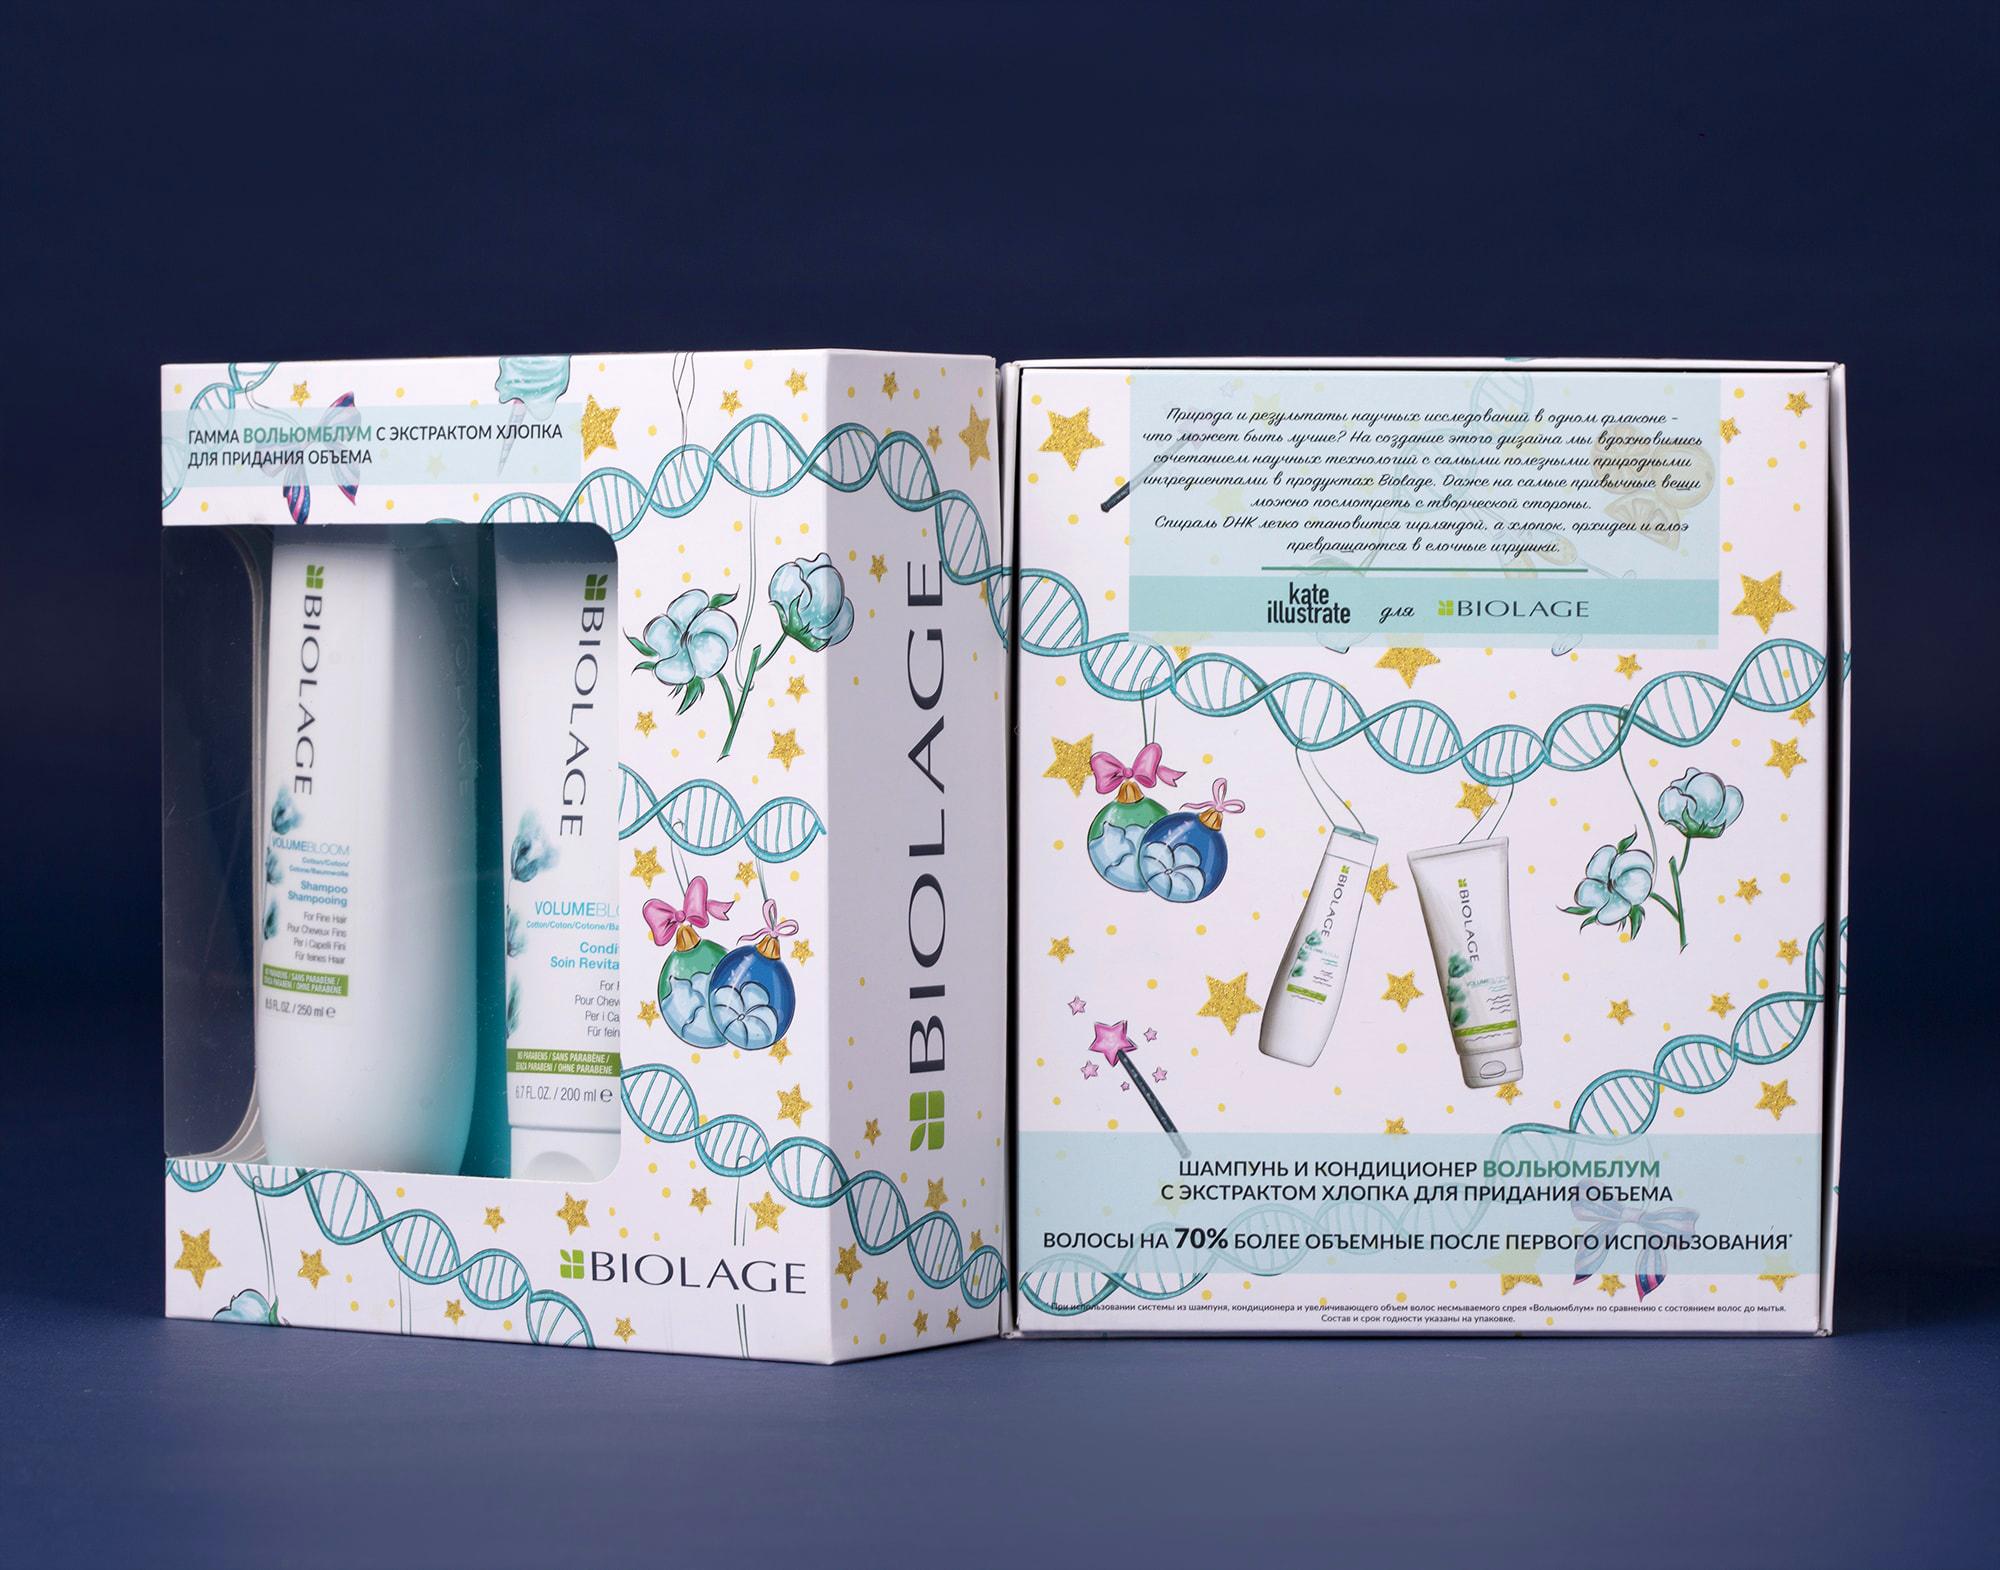 biolage new year box illustration